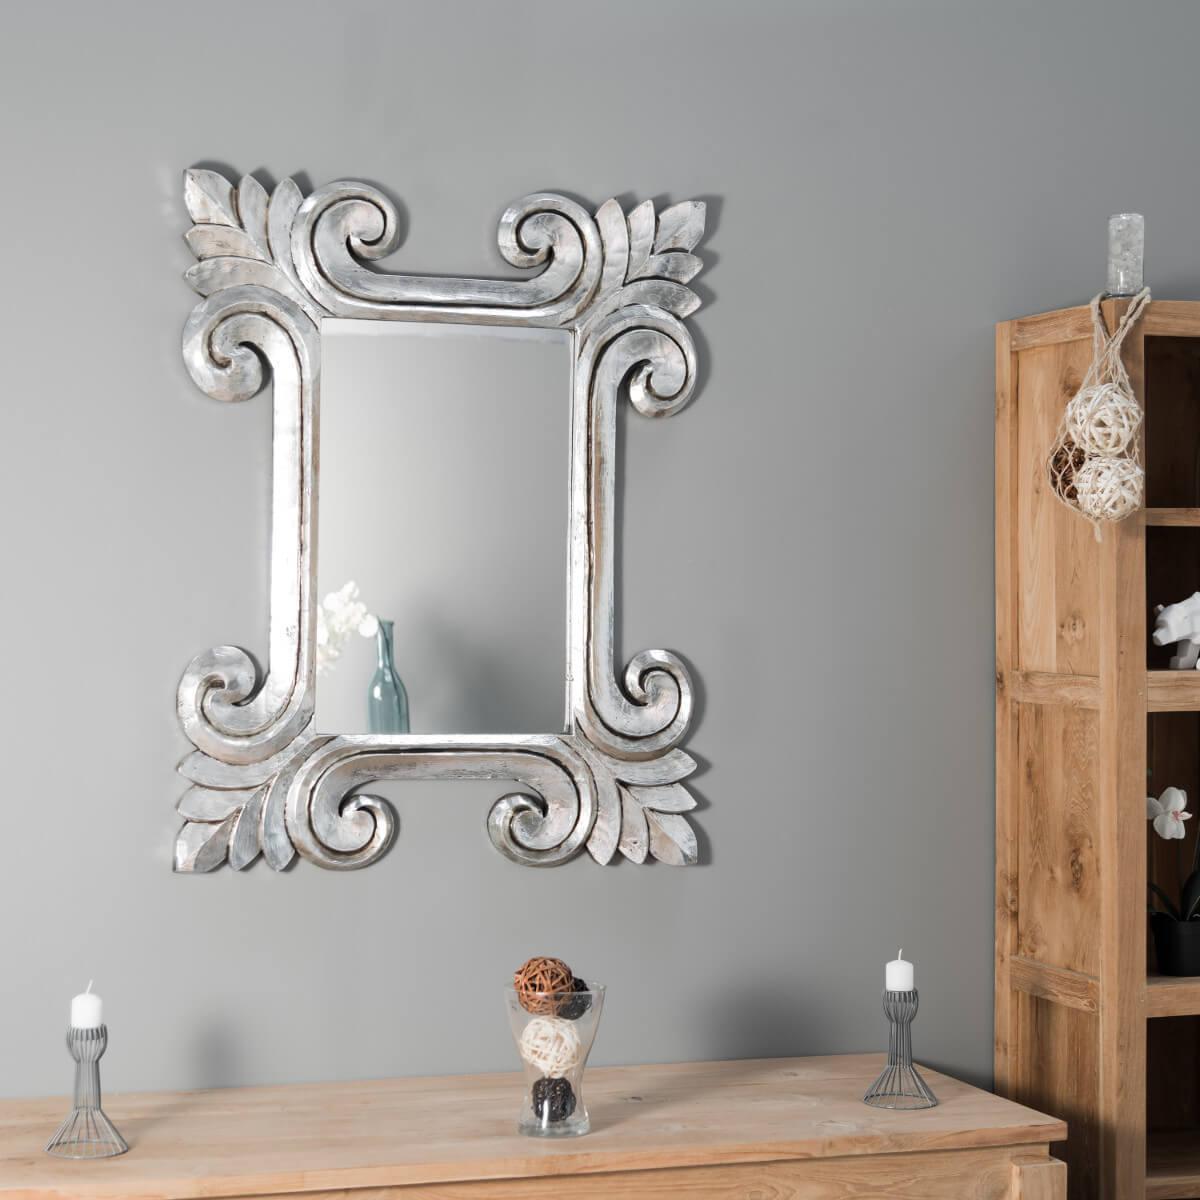 Espejo toledo de madera con p tina plateada 80 x 100 for Espejo 60 x 100